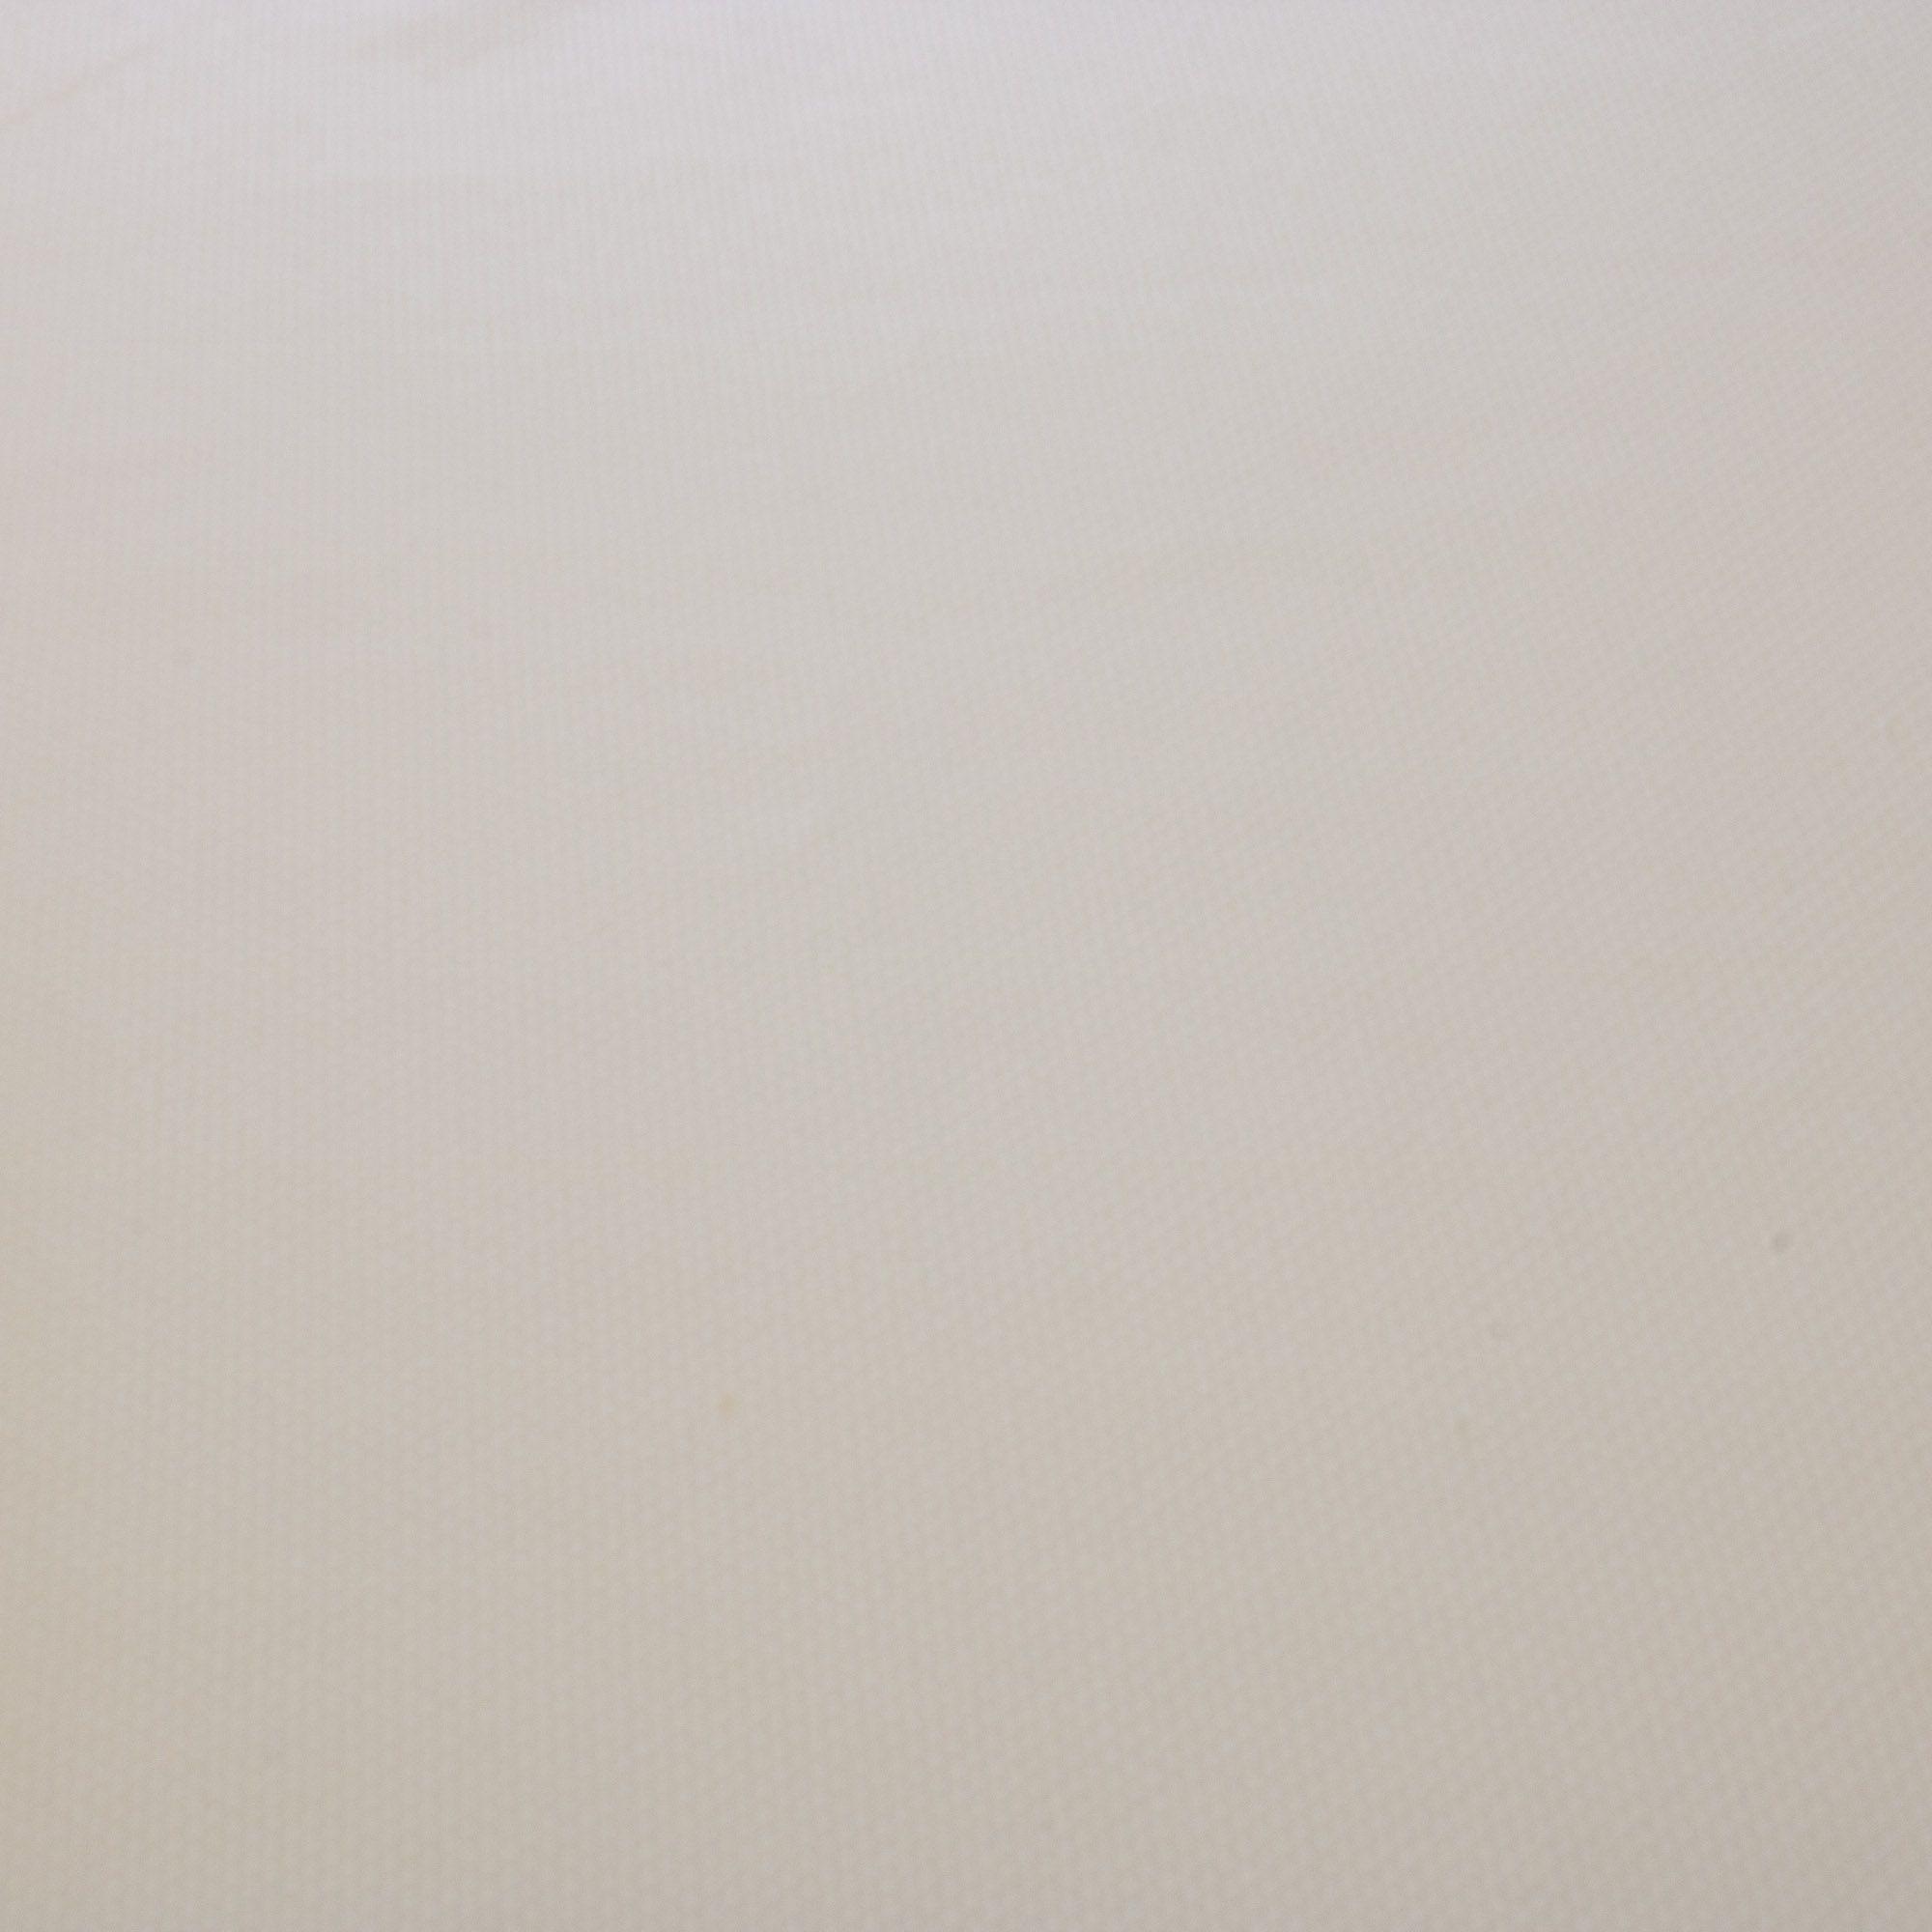 Tecido Para Bordar Vagonite Dohler 100% Algodao 1,50 Mt Largura Branco